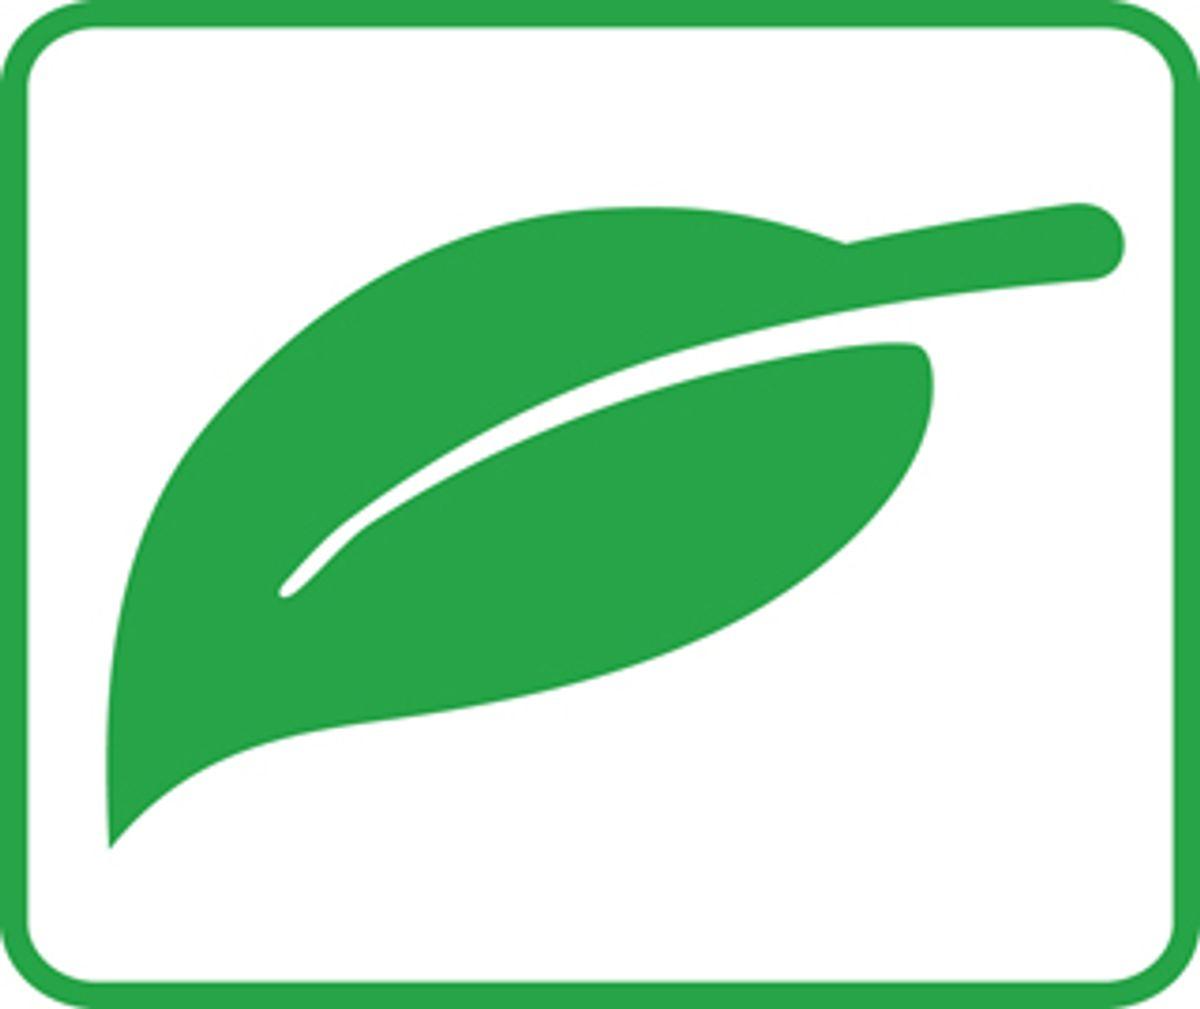 Penske Logistics Given Green Supply Chain Award